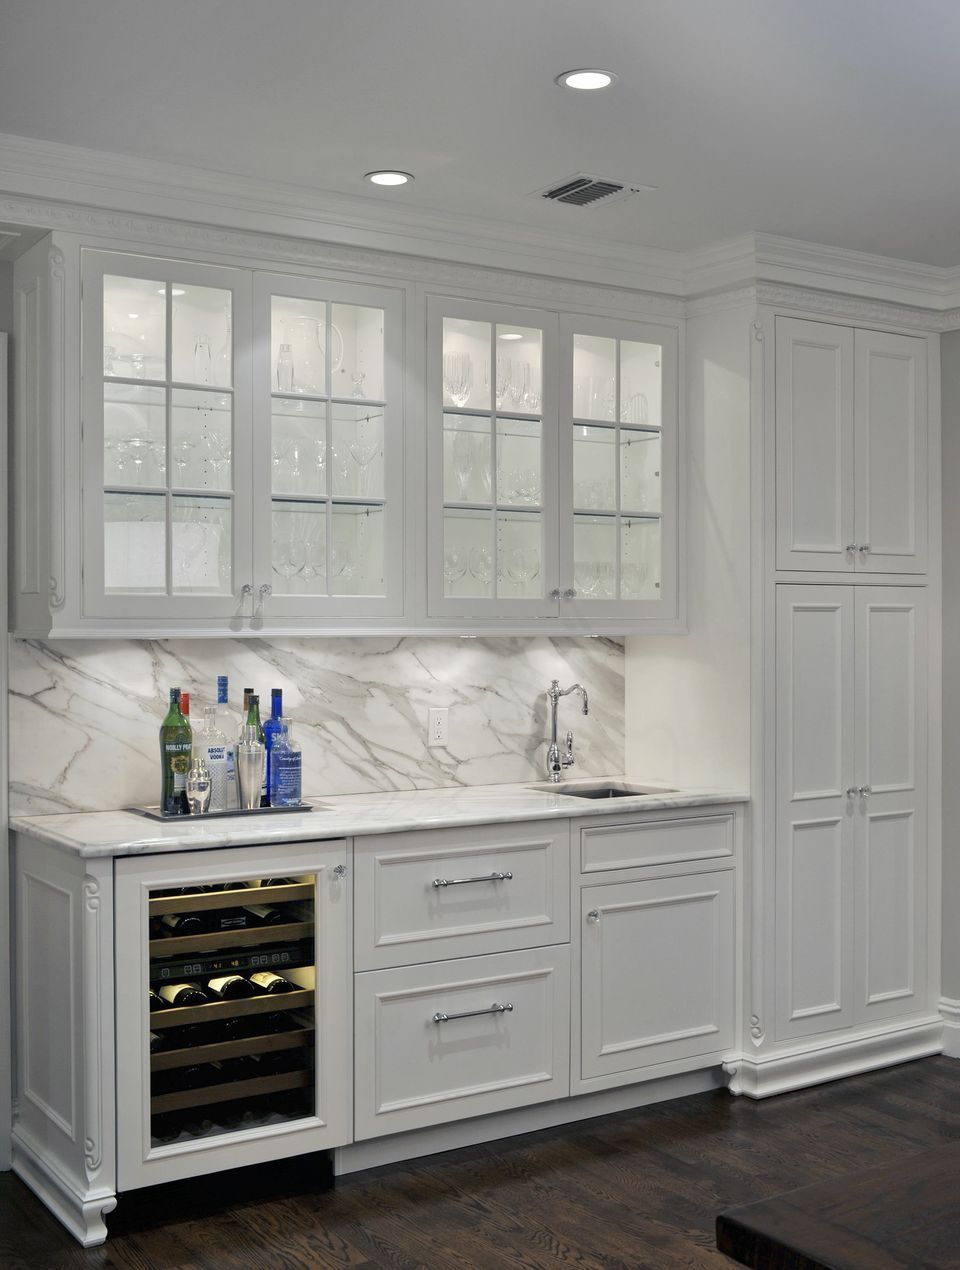 Transitional Kitchen Design Showcase Kitchens New York Custom Kitchen Remodel Transitional Kitchen Design Kitchen Cabinets For Sale